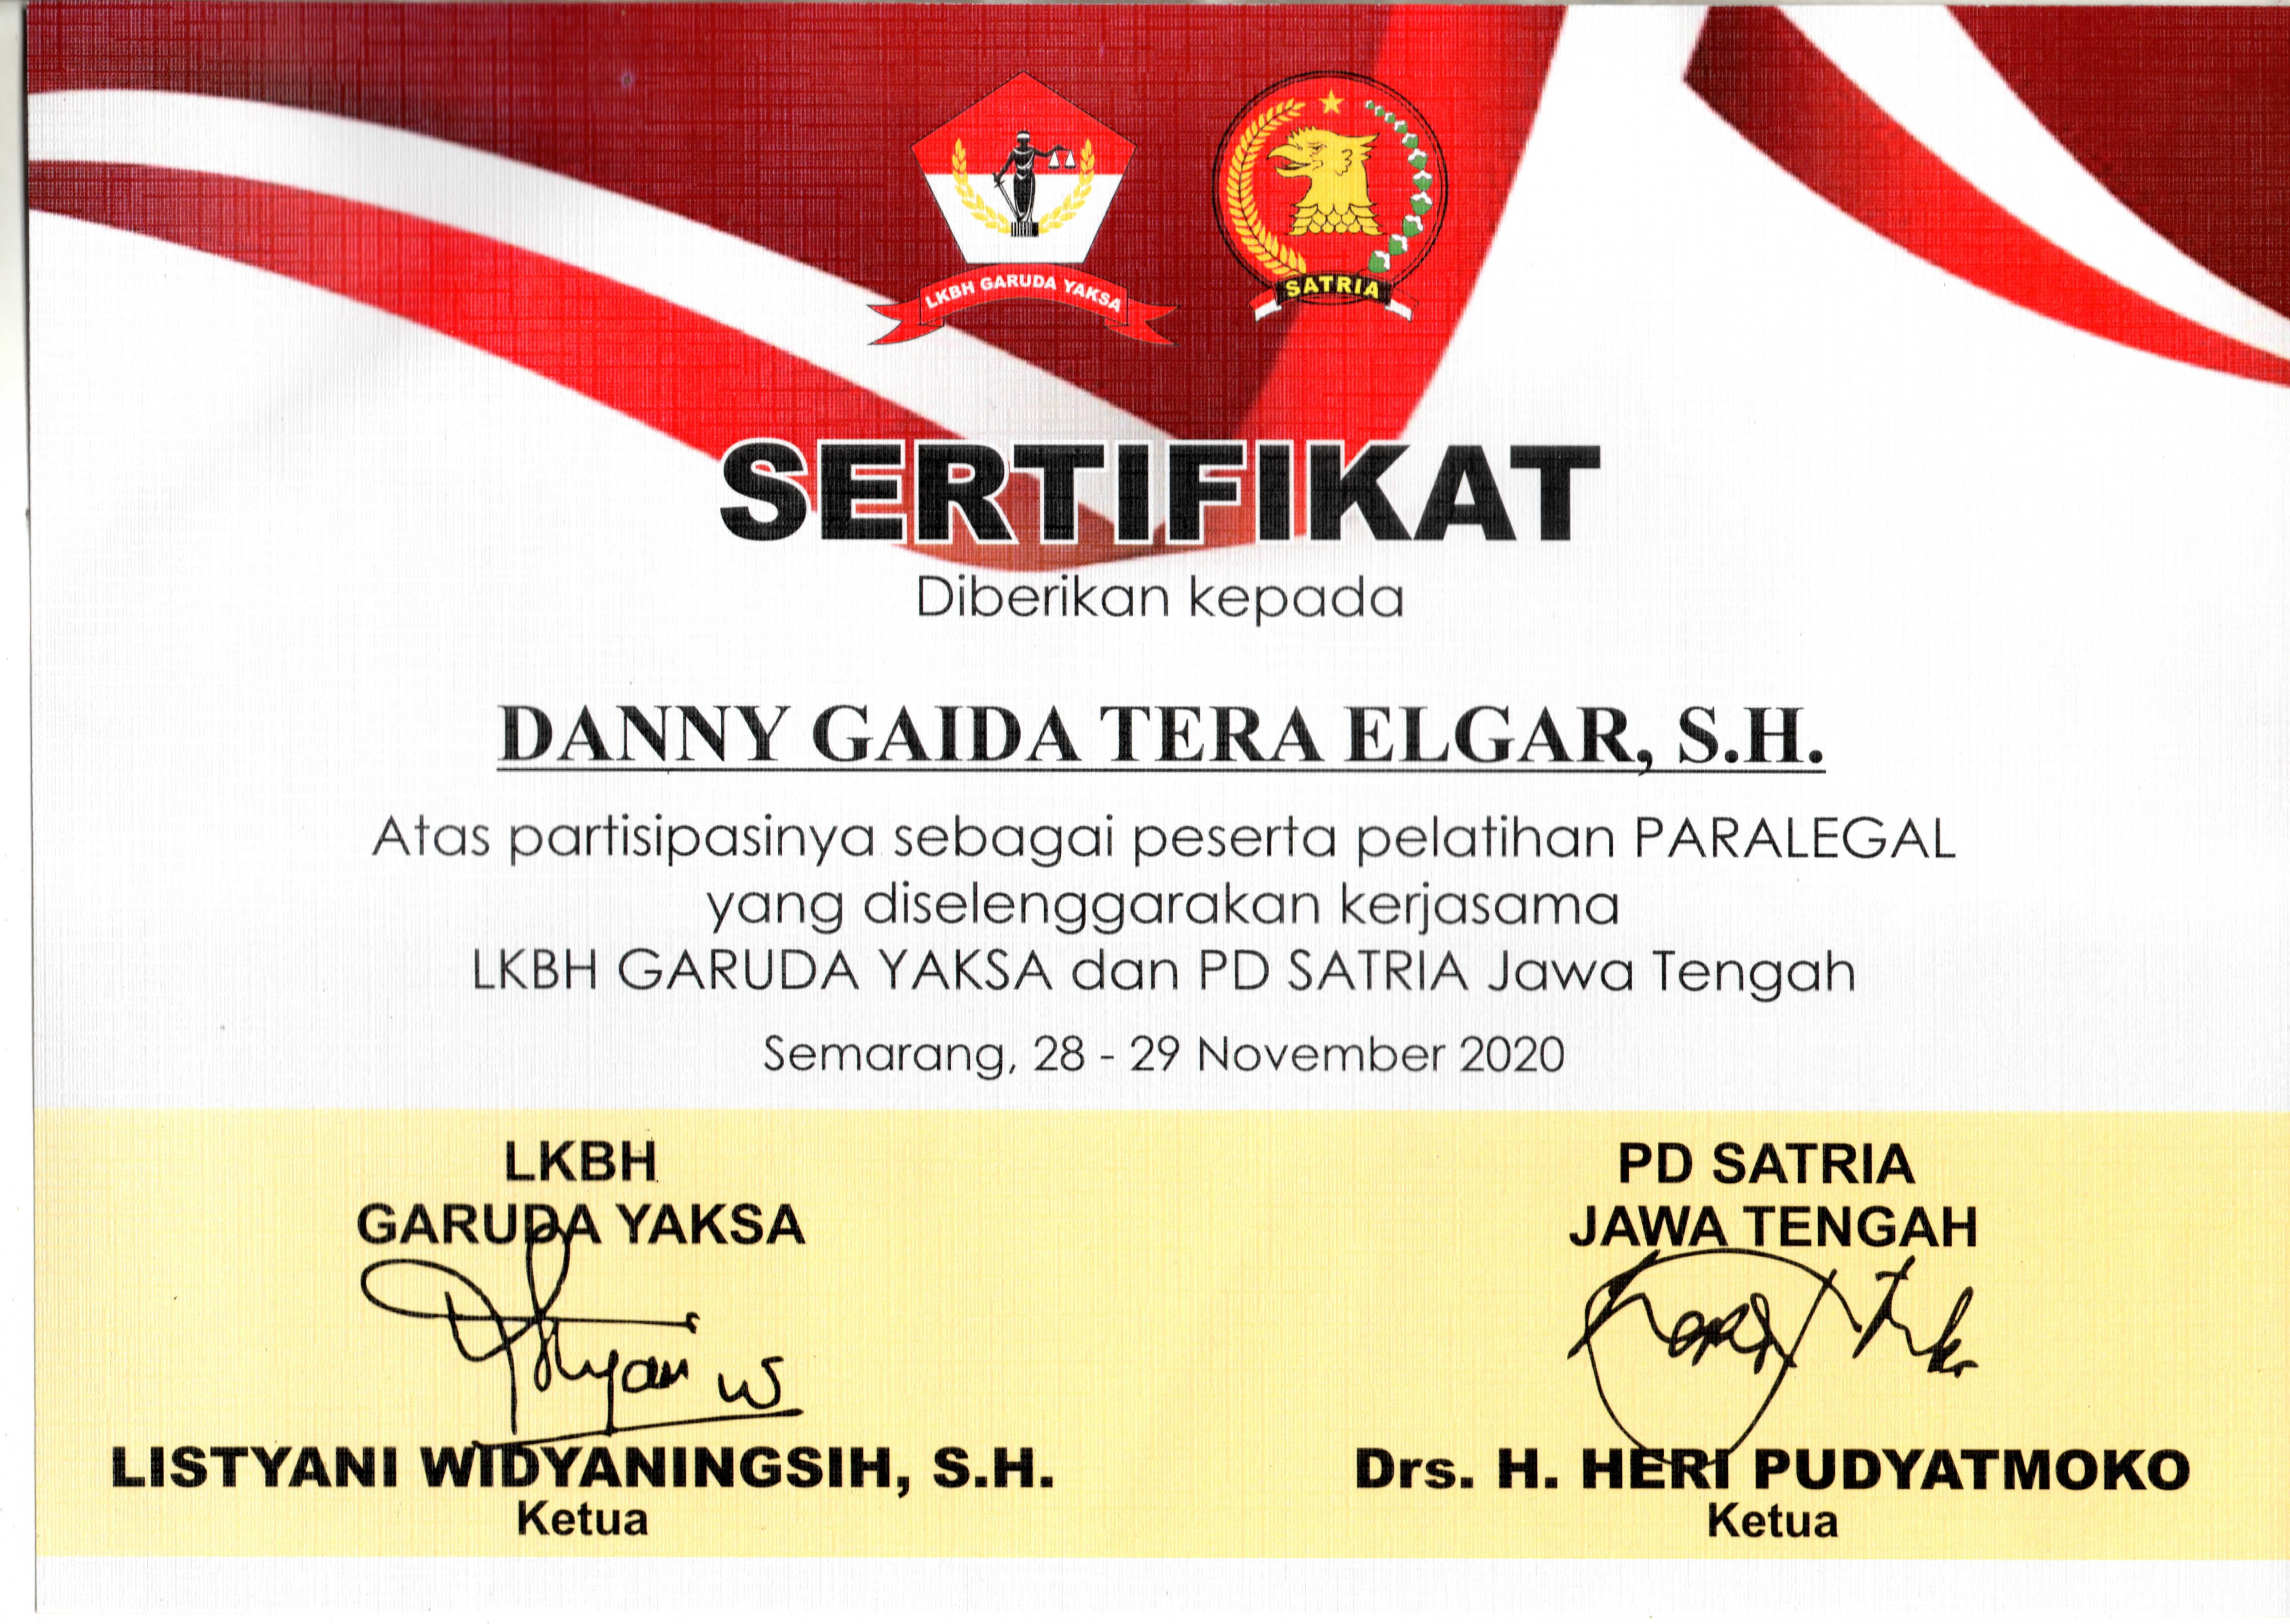 Sertifikat Pelatihan Paralegal Lembaga Konsultasi dan Bantuan Hukum (LKBH) Garuda Yaksa | Pimpinan Daerah (PD) Satuan Relawan Indonesia Raya (SATRIA) Partai Gerindra Provinsi Jawa Tengah